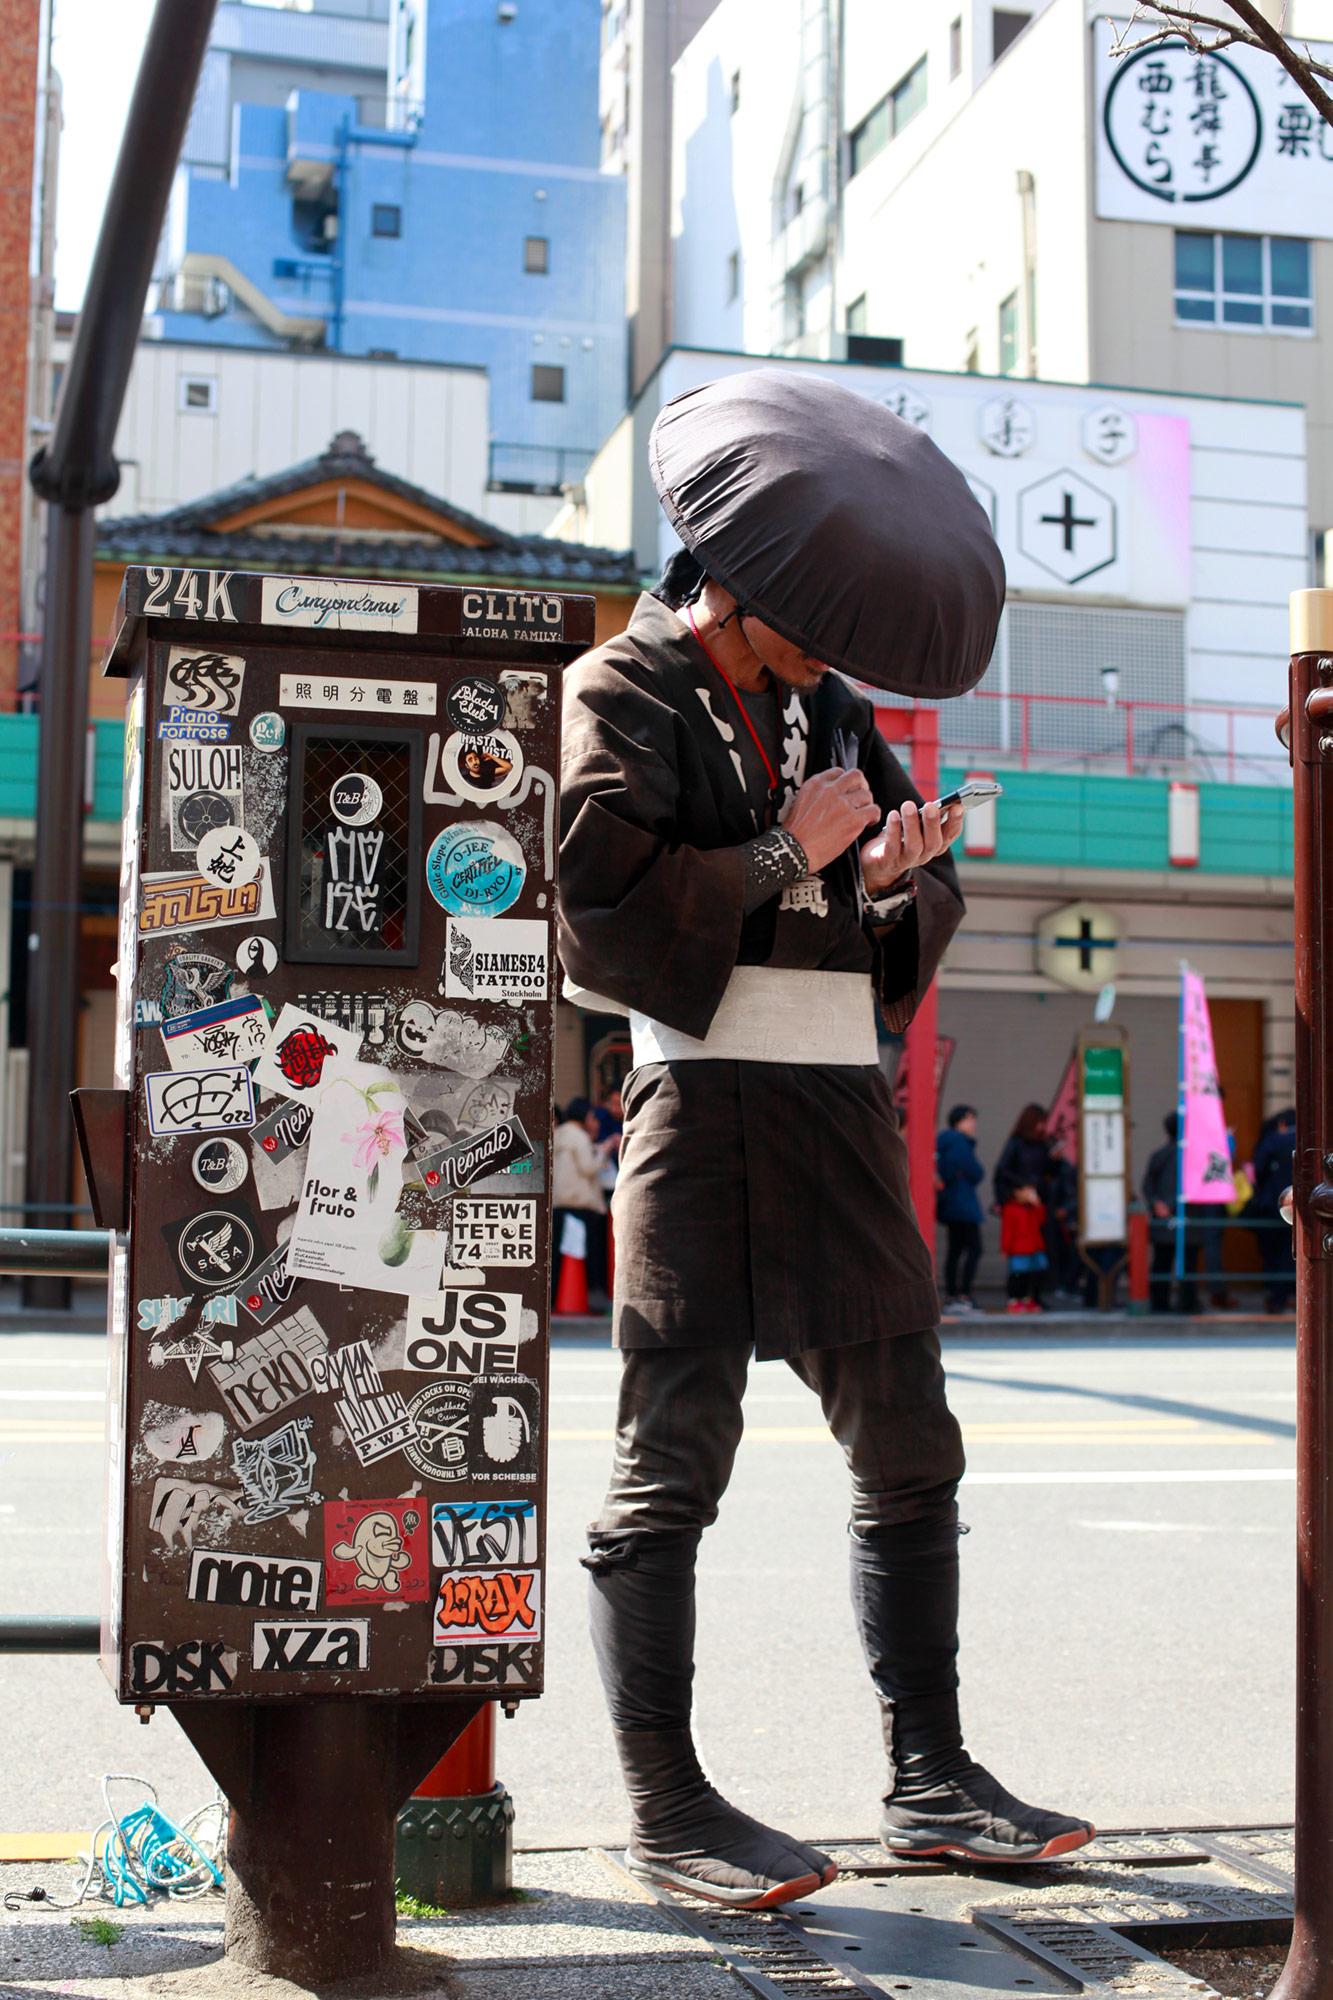 On the street: Tokyo by Sheila Velasco